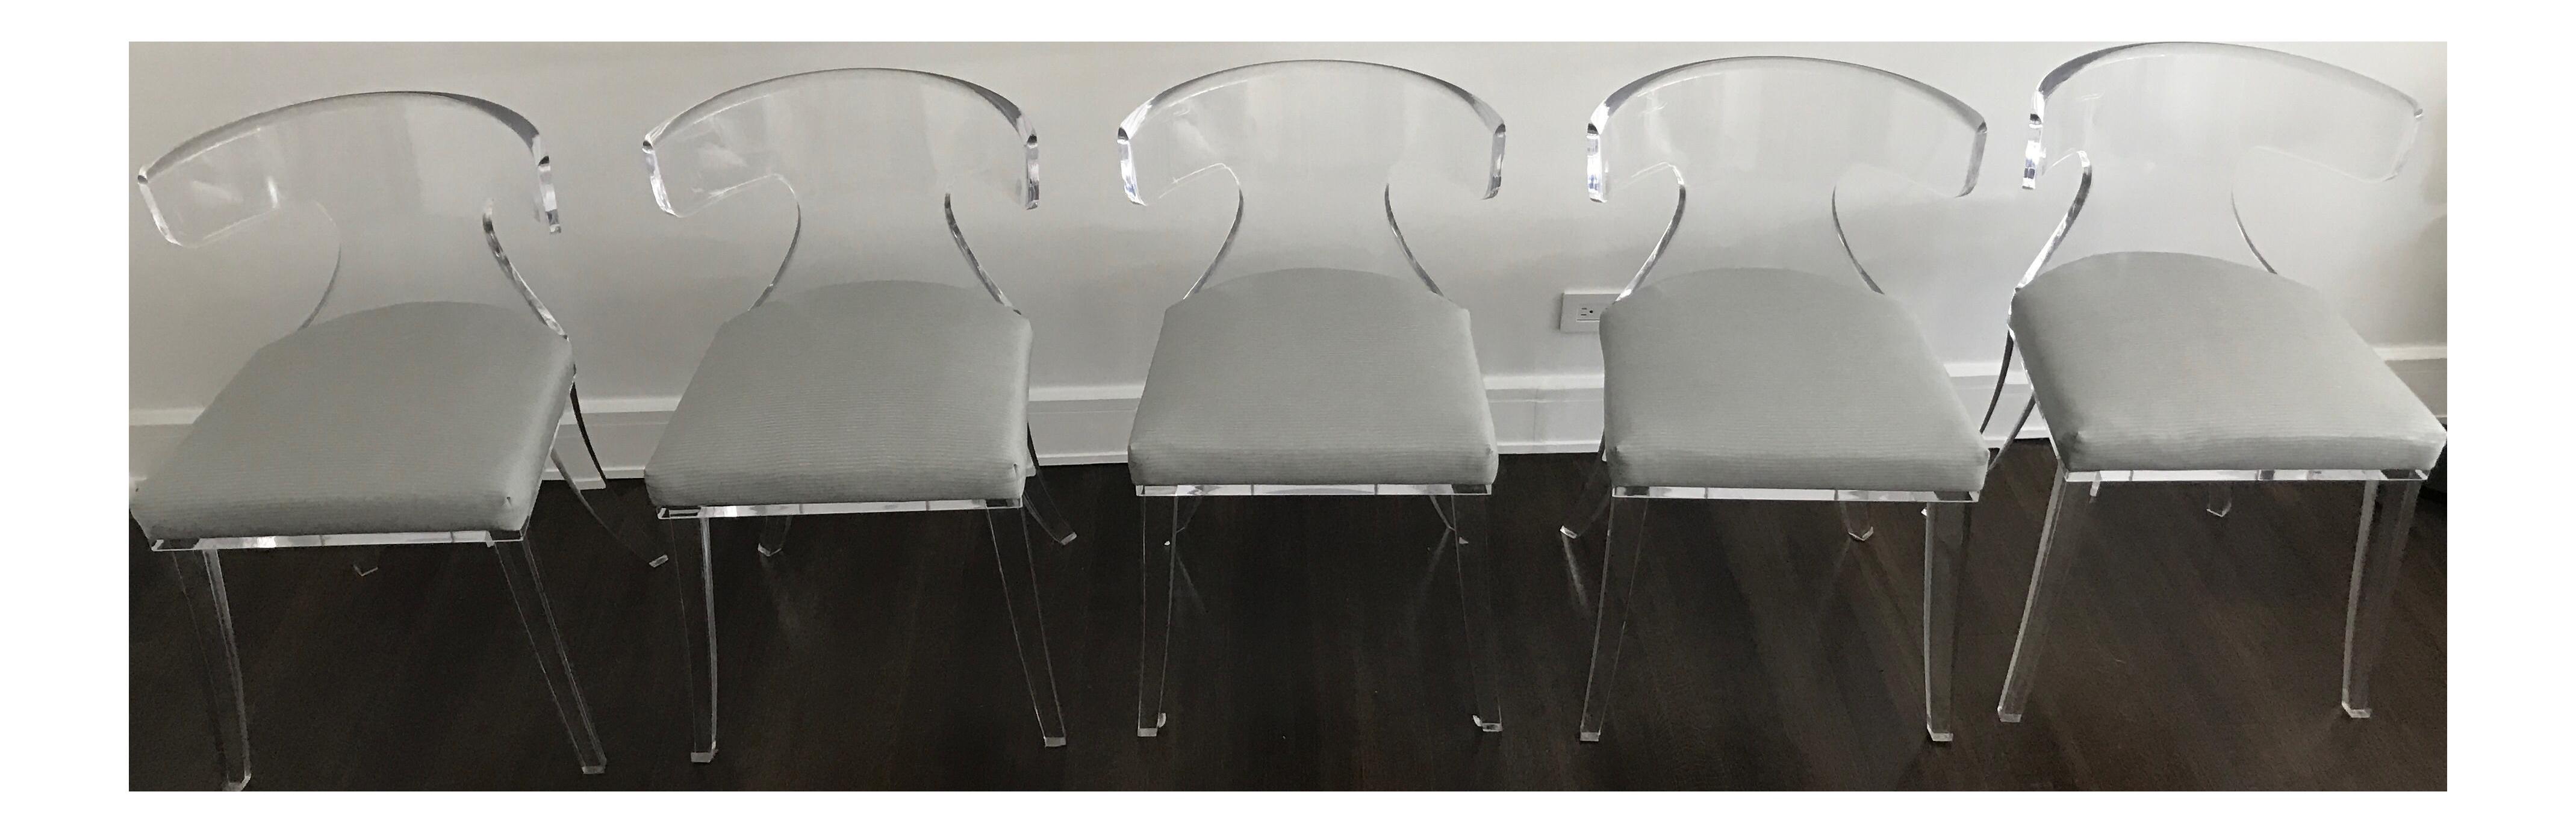 h studio verona lucite chairs set of 5